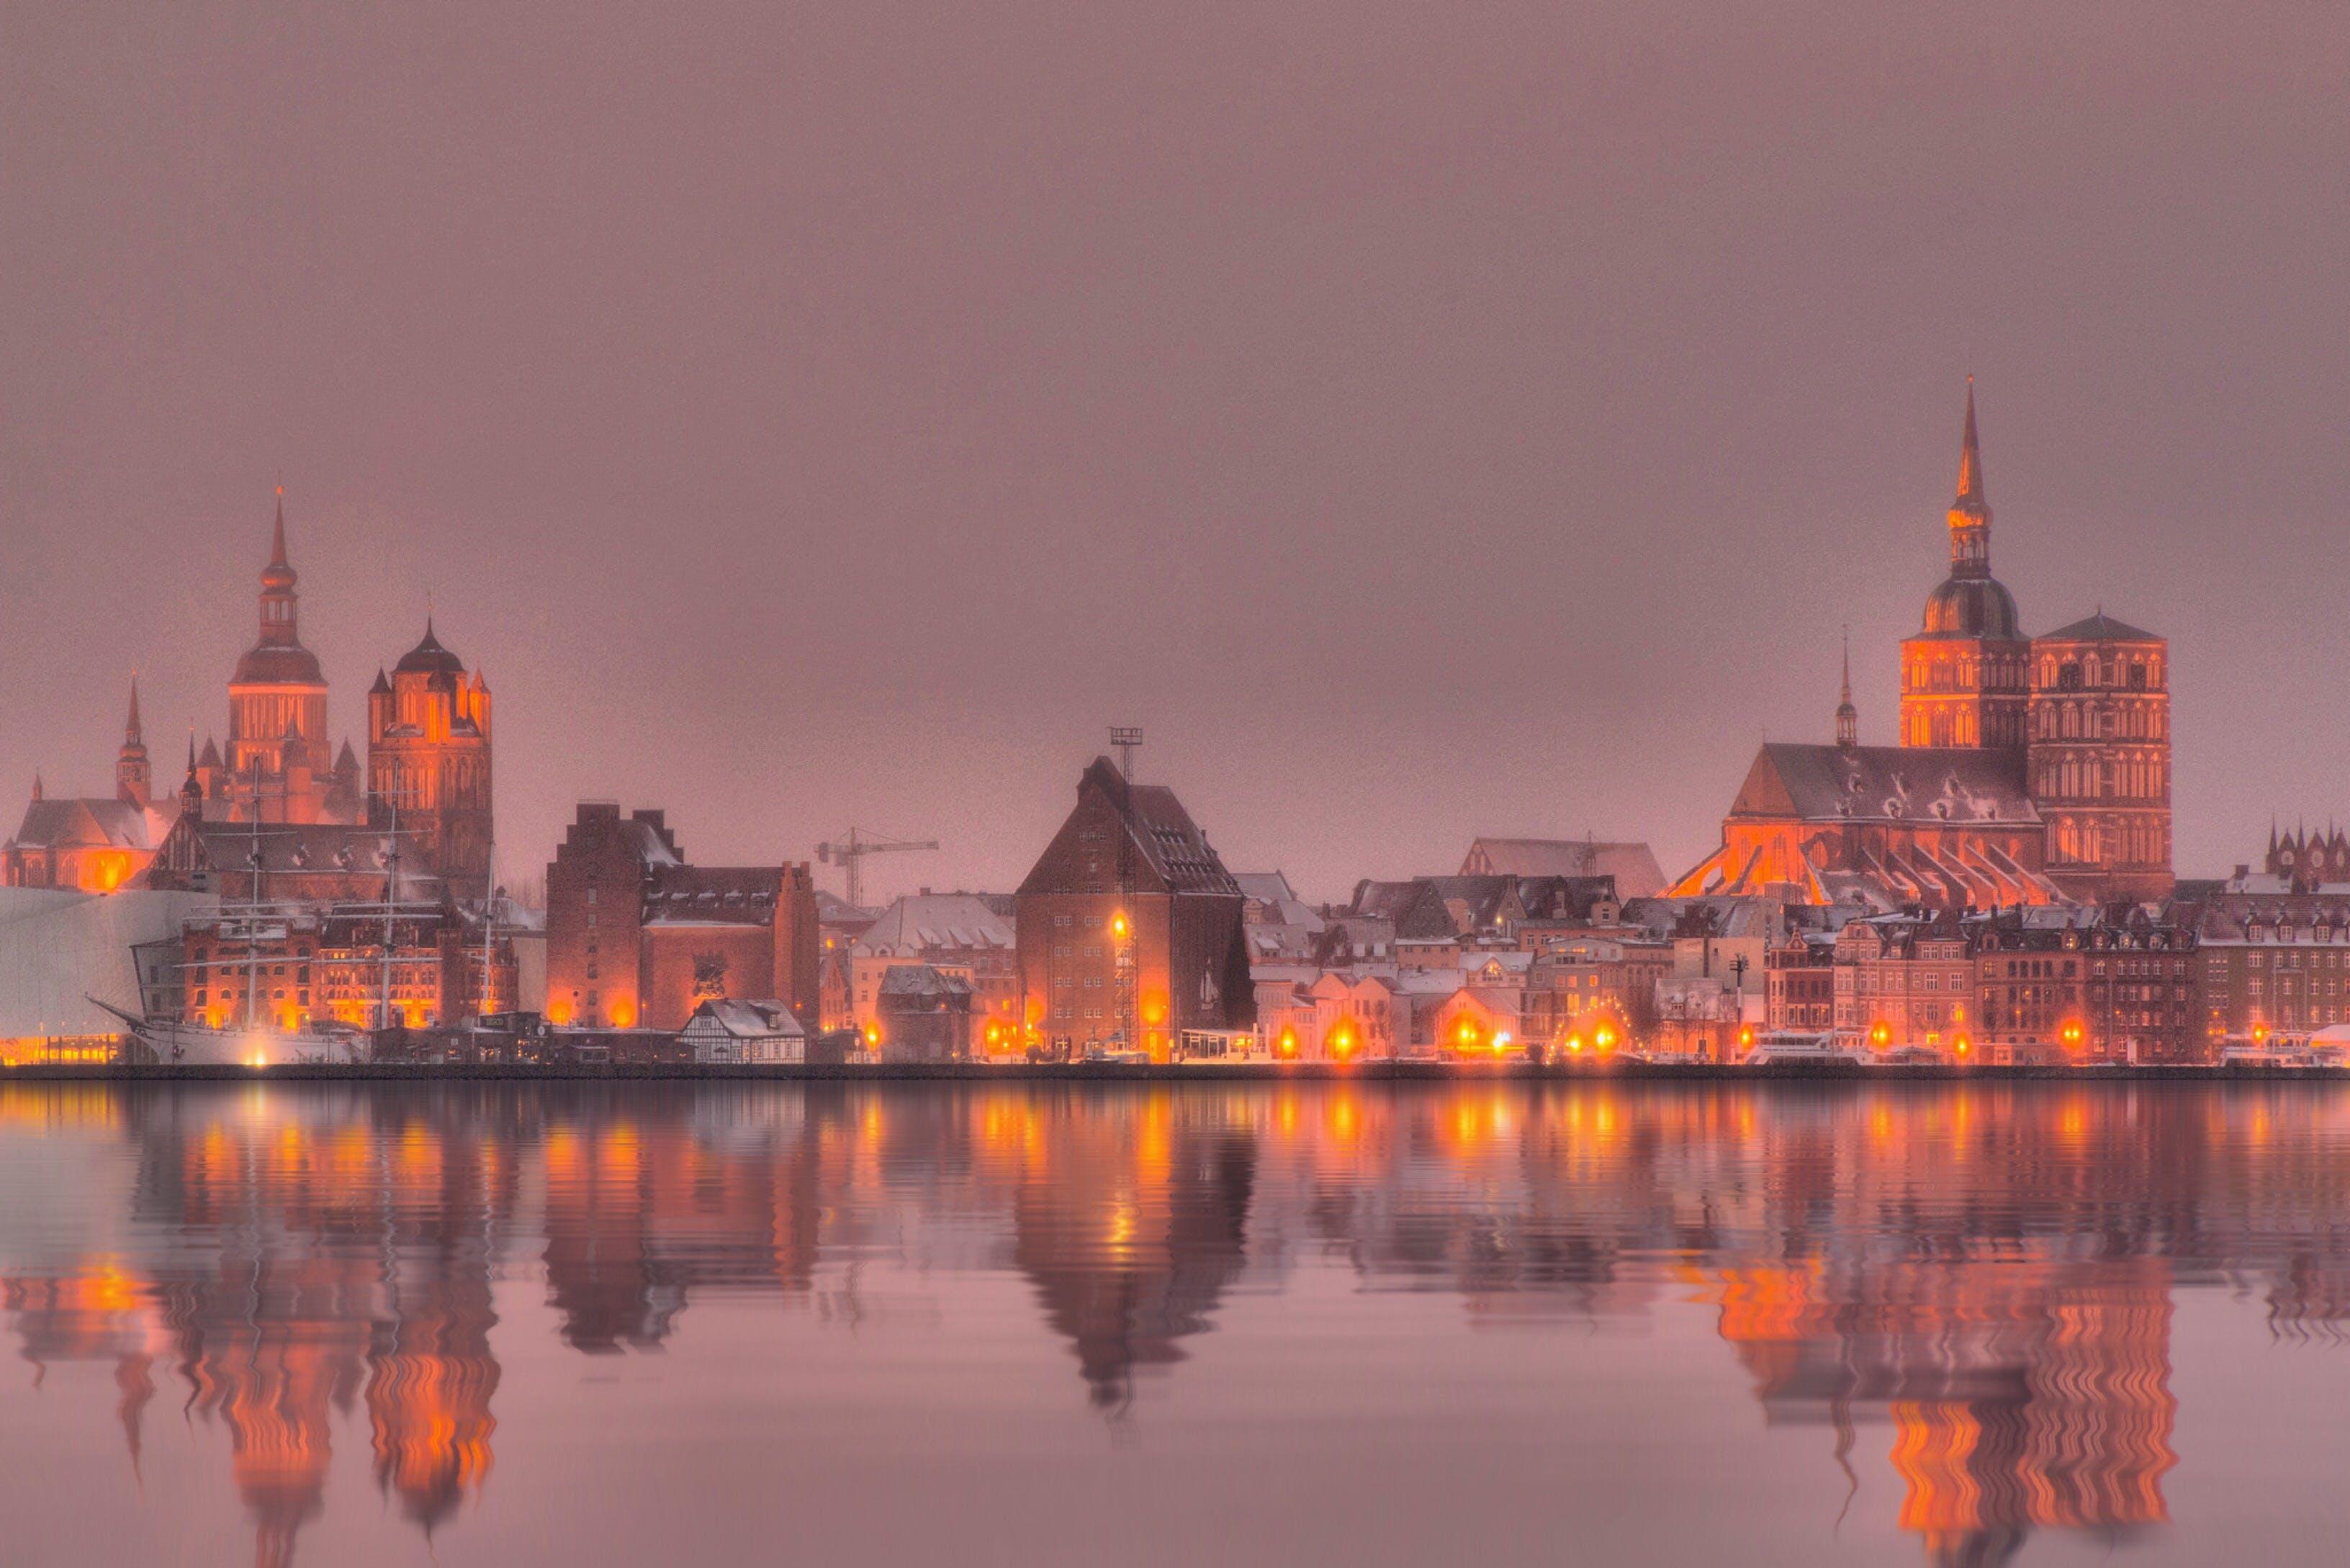 Ingyenes stockfotó kirche, licht, lichter der stadt, part témában